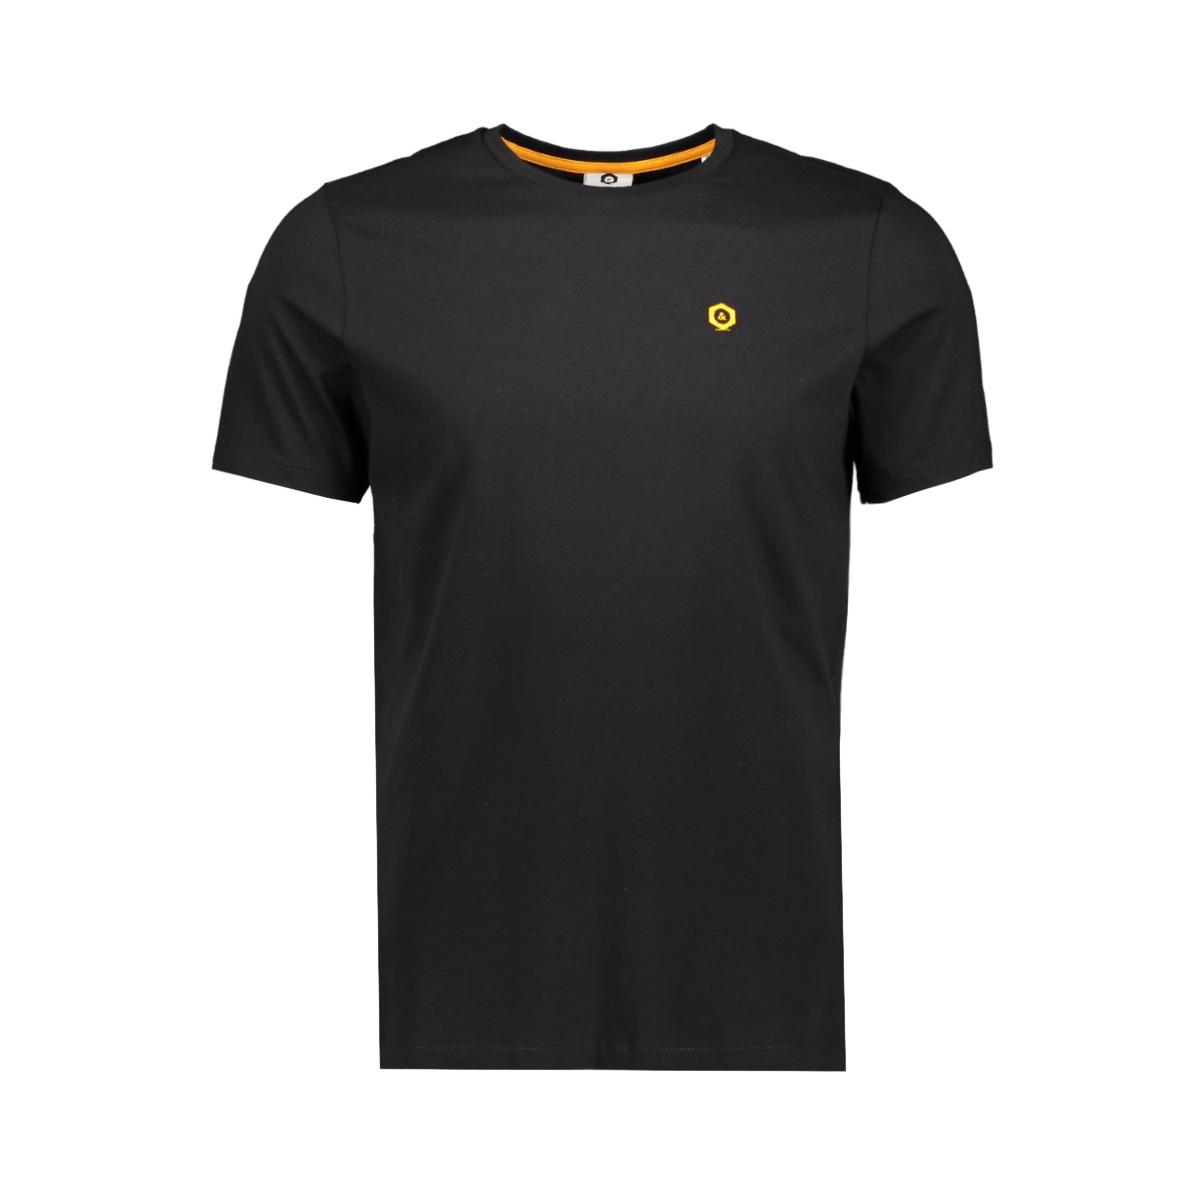 jcoboston tee ss crew neck 12156938 jack & jones t-shirt black/slim